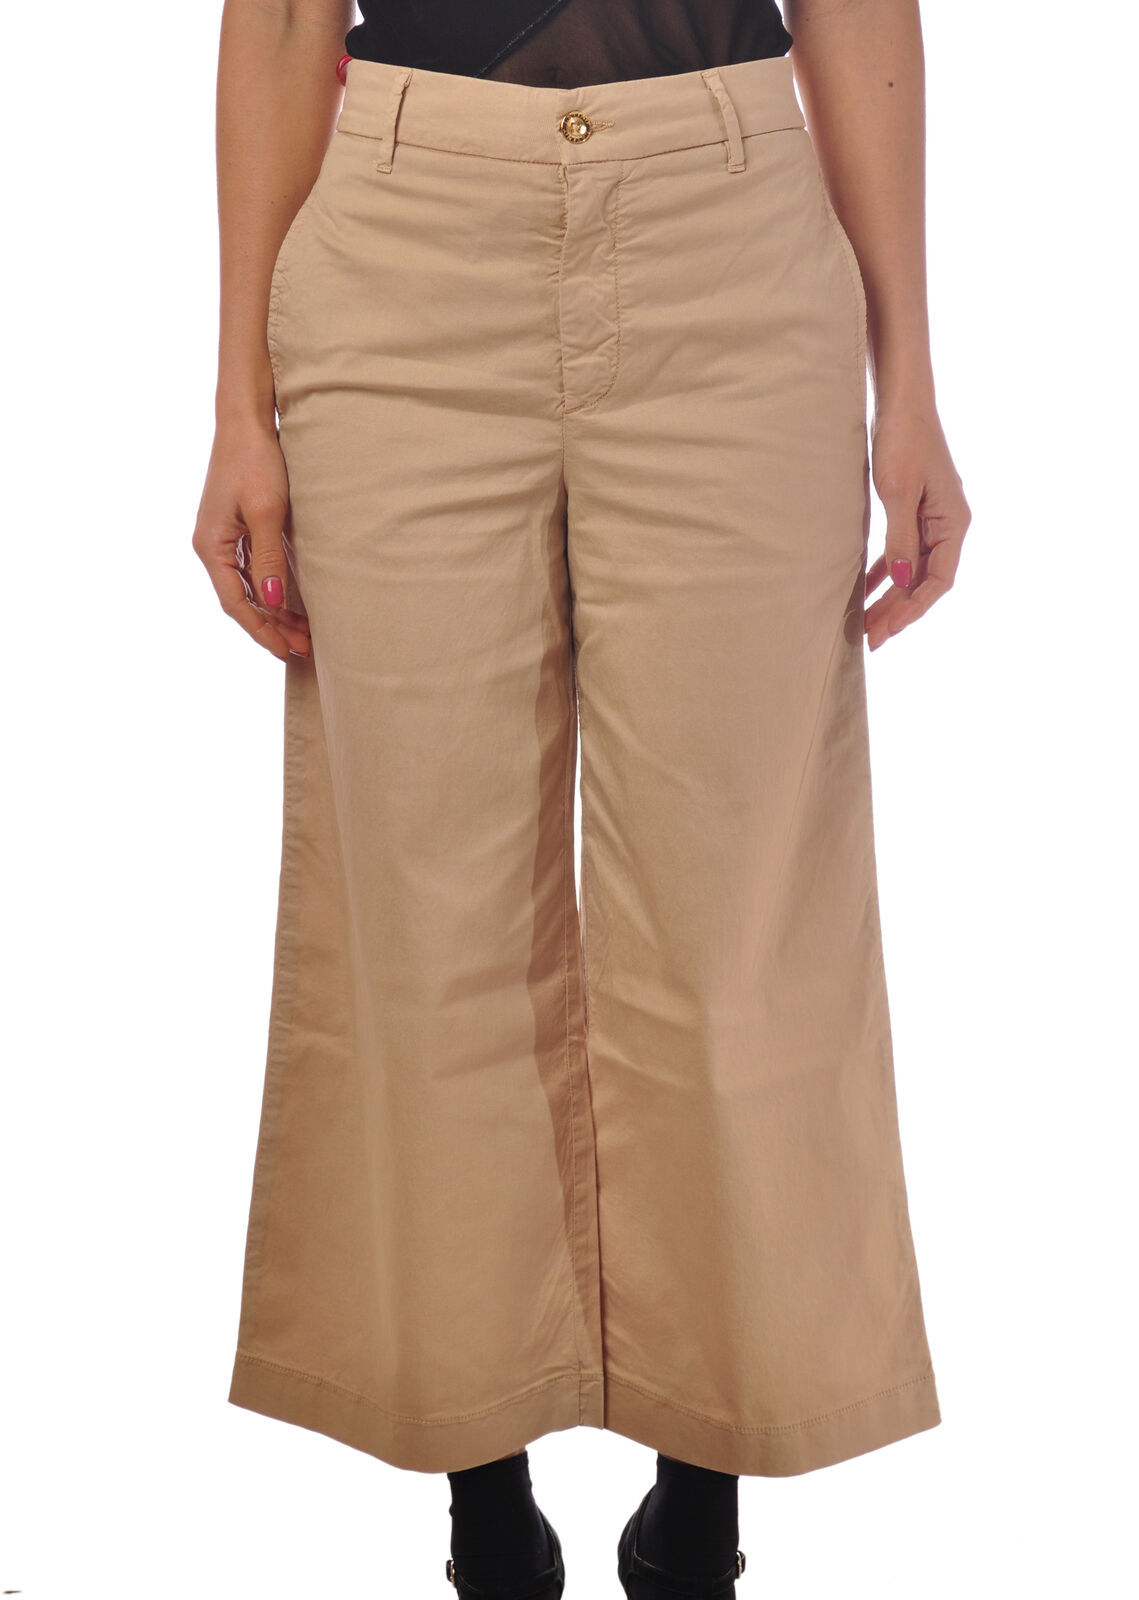 Latinò - Pants-Pants - Woman - Beige - 5102517F183559